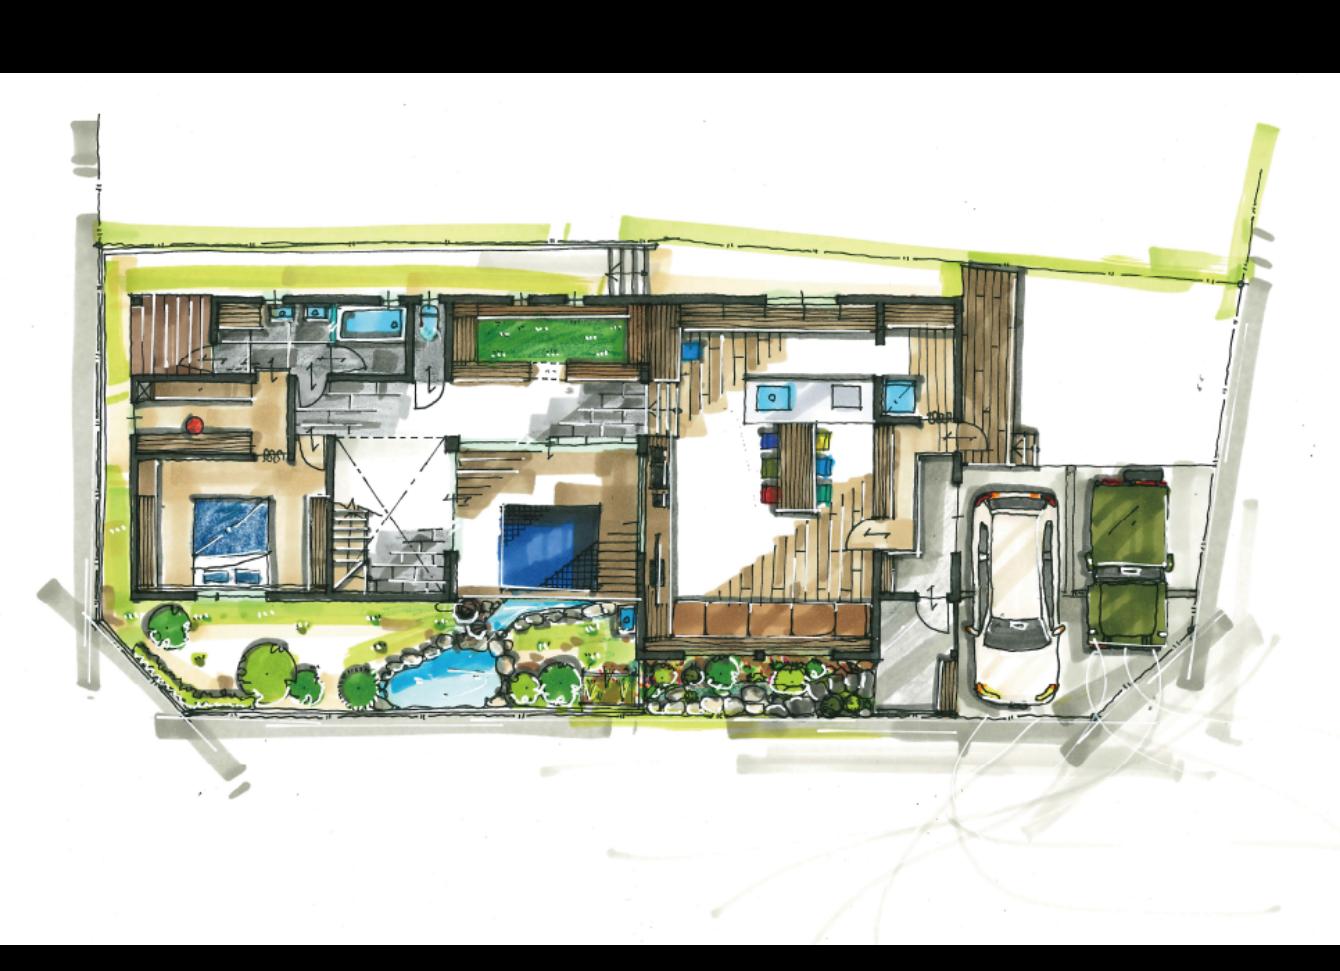 CONCEPT HOUSE 01